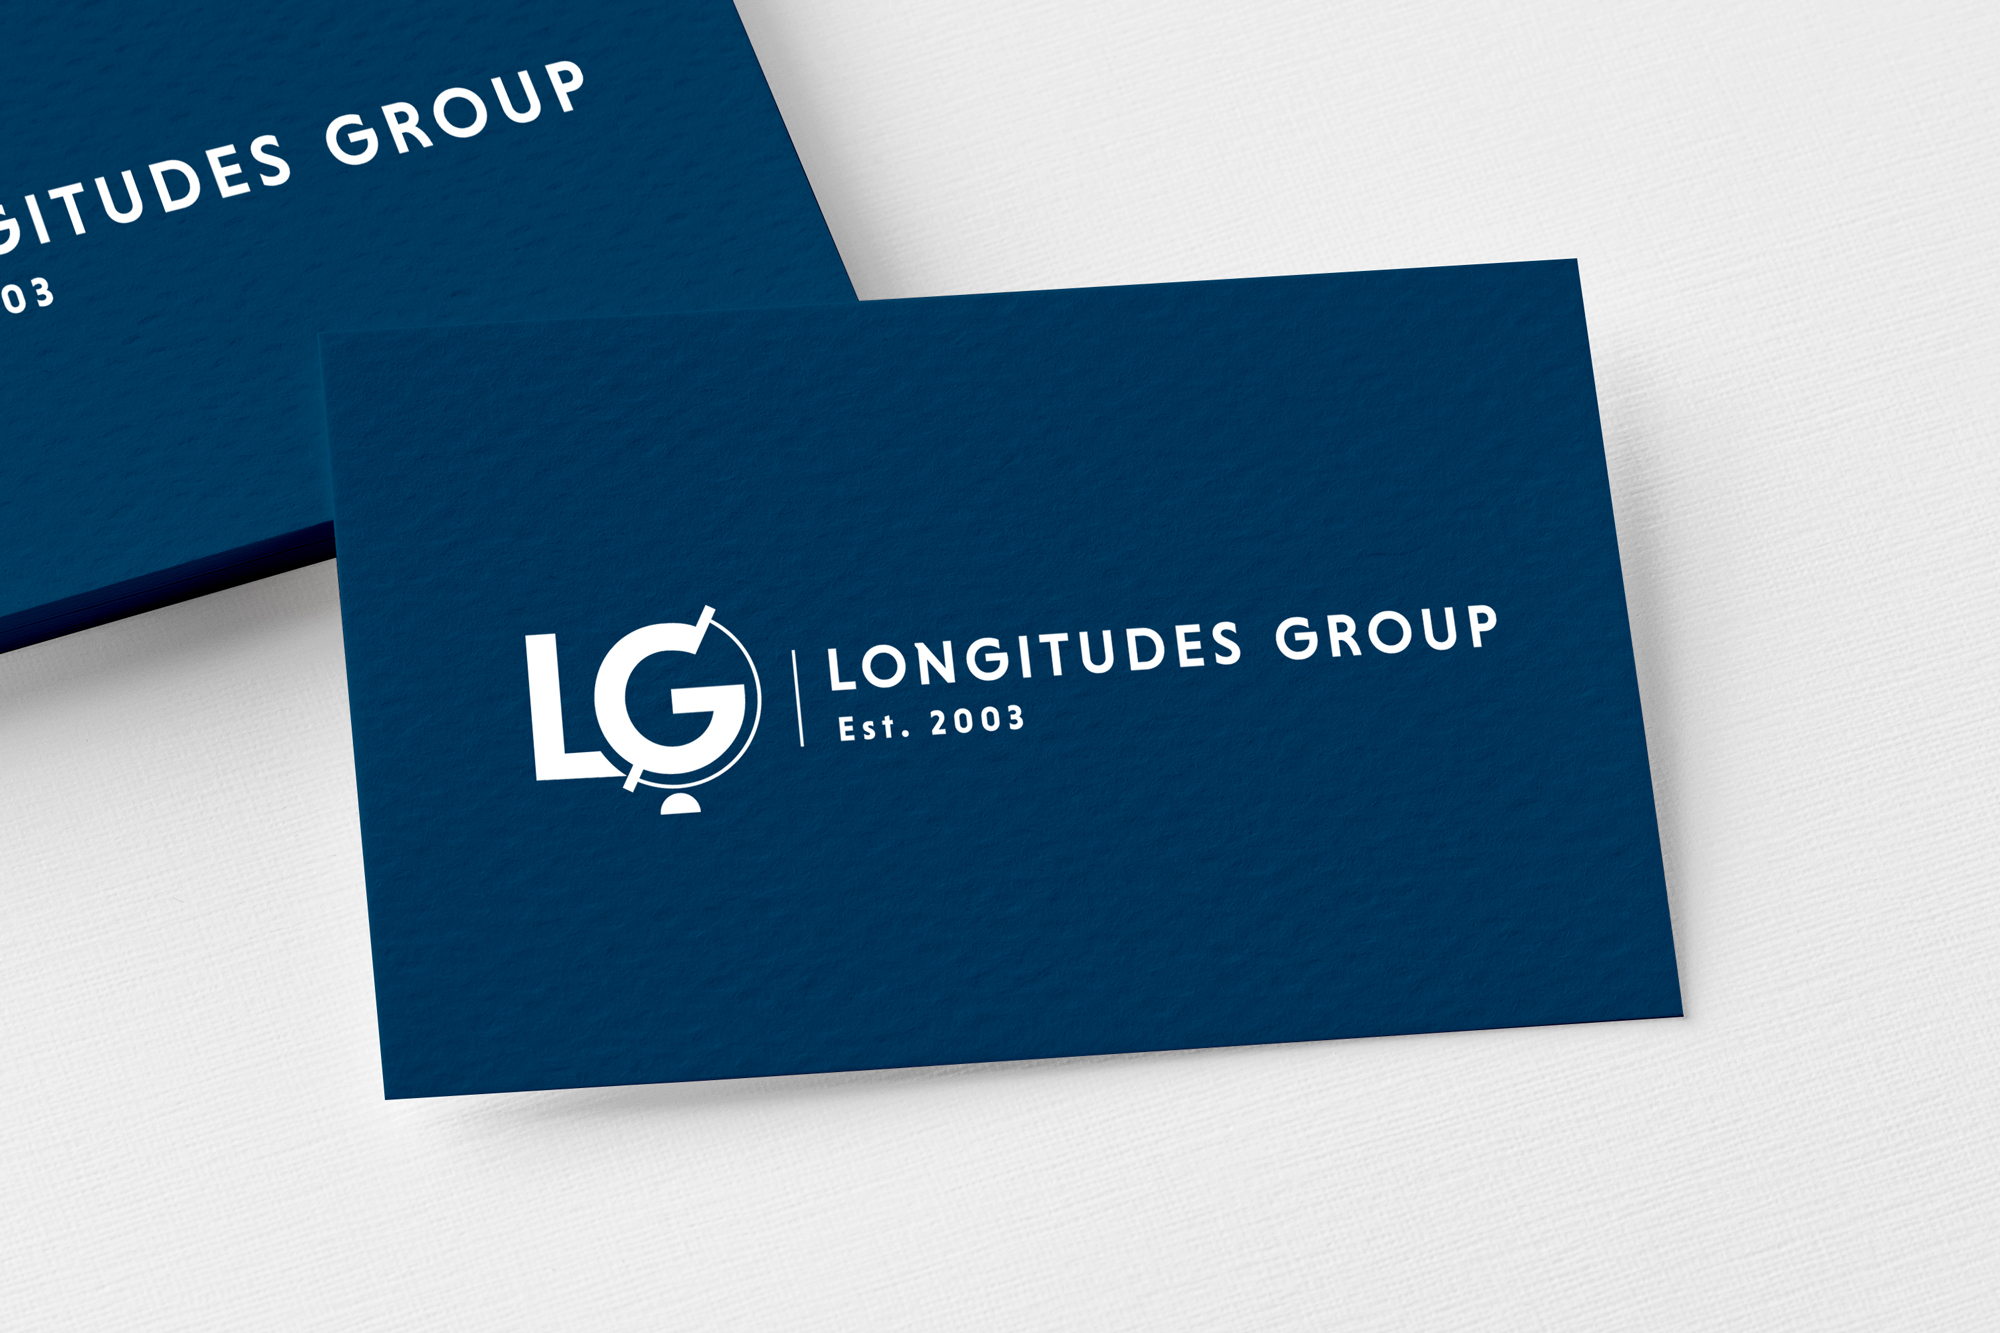 Longitudes-Group---Business-Cards